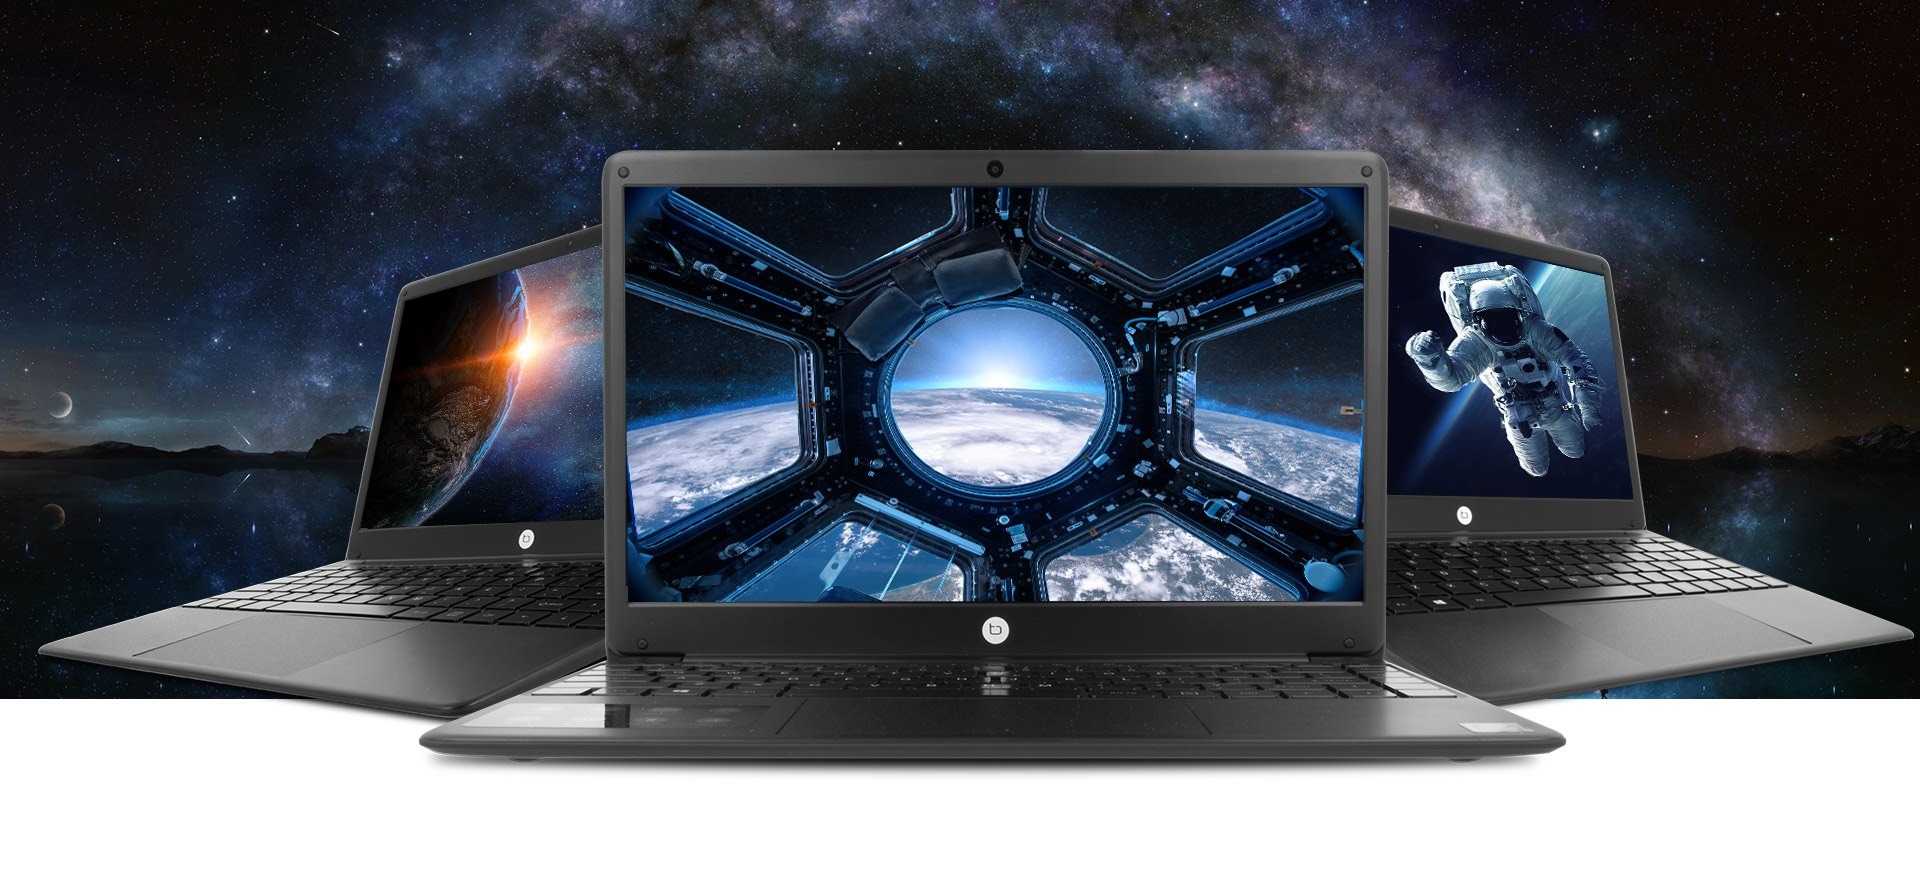 techbite Zin 2 laptop